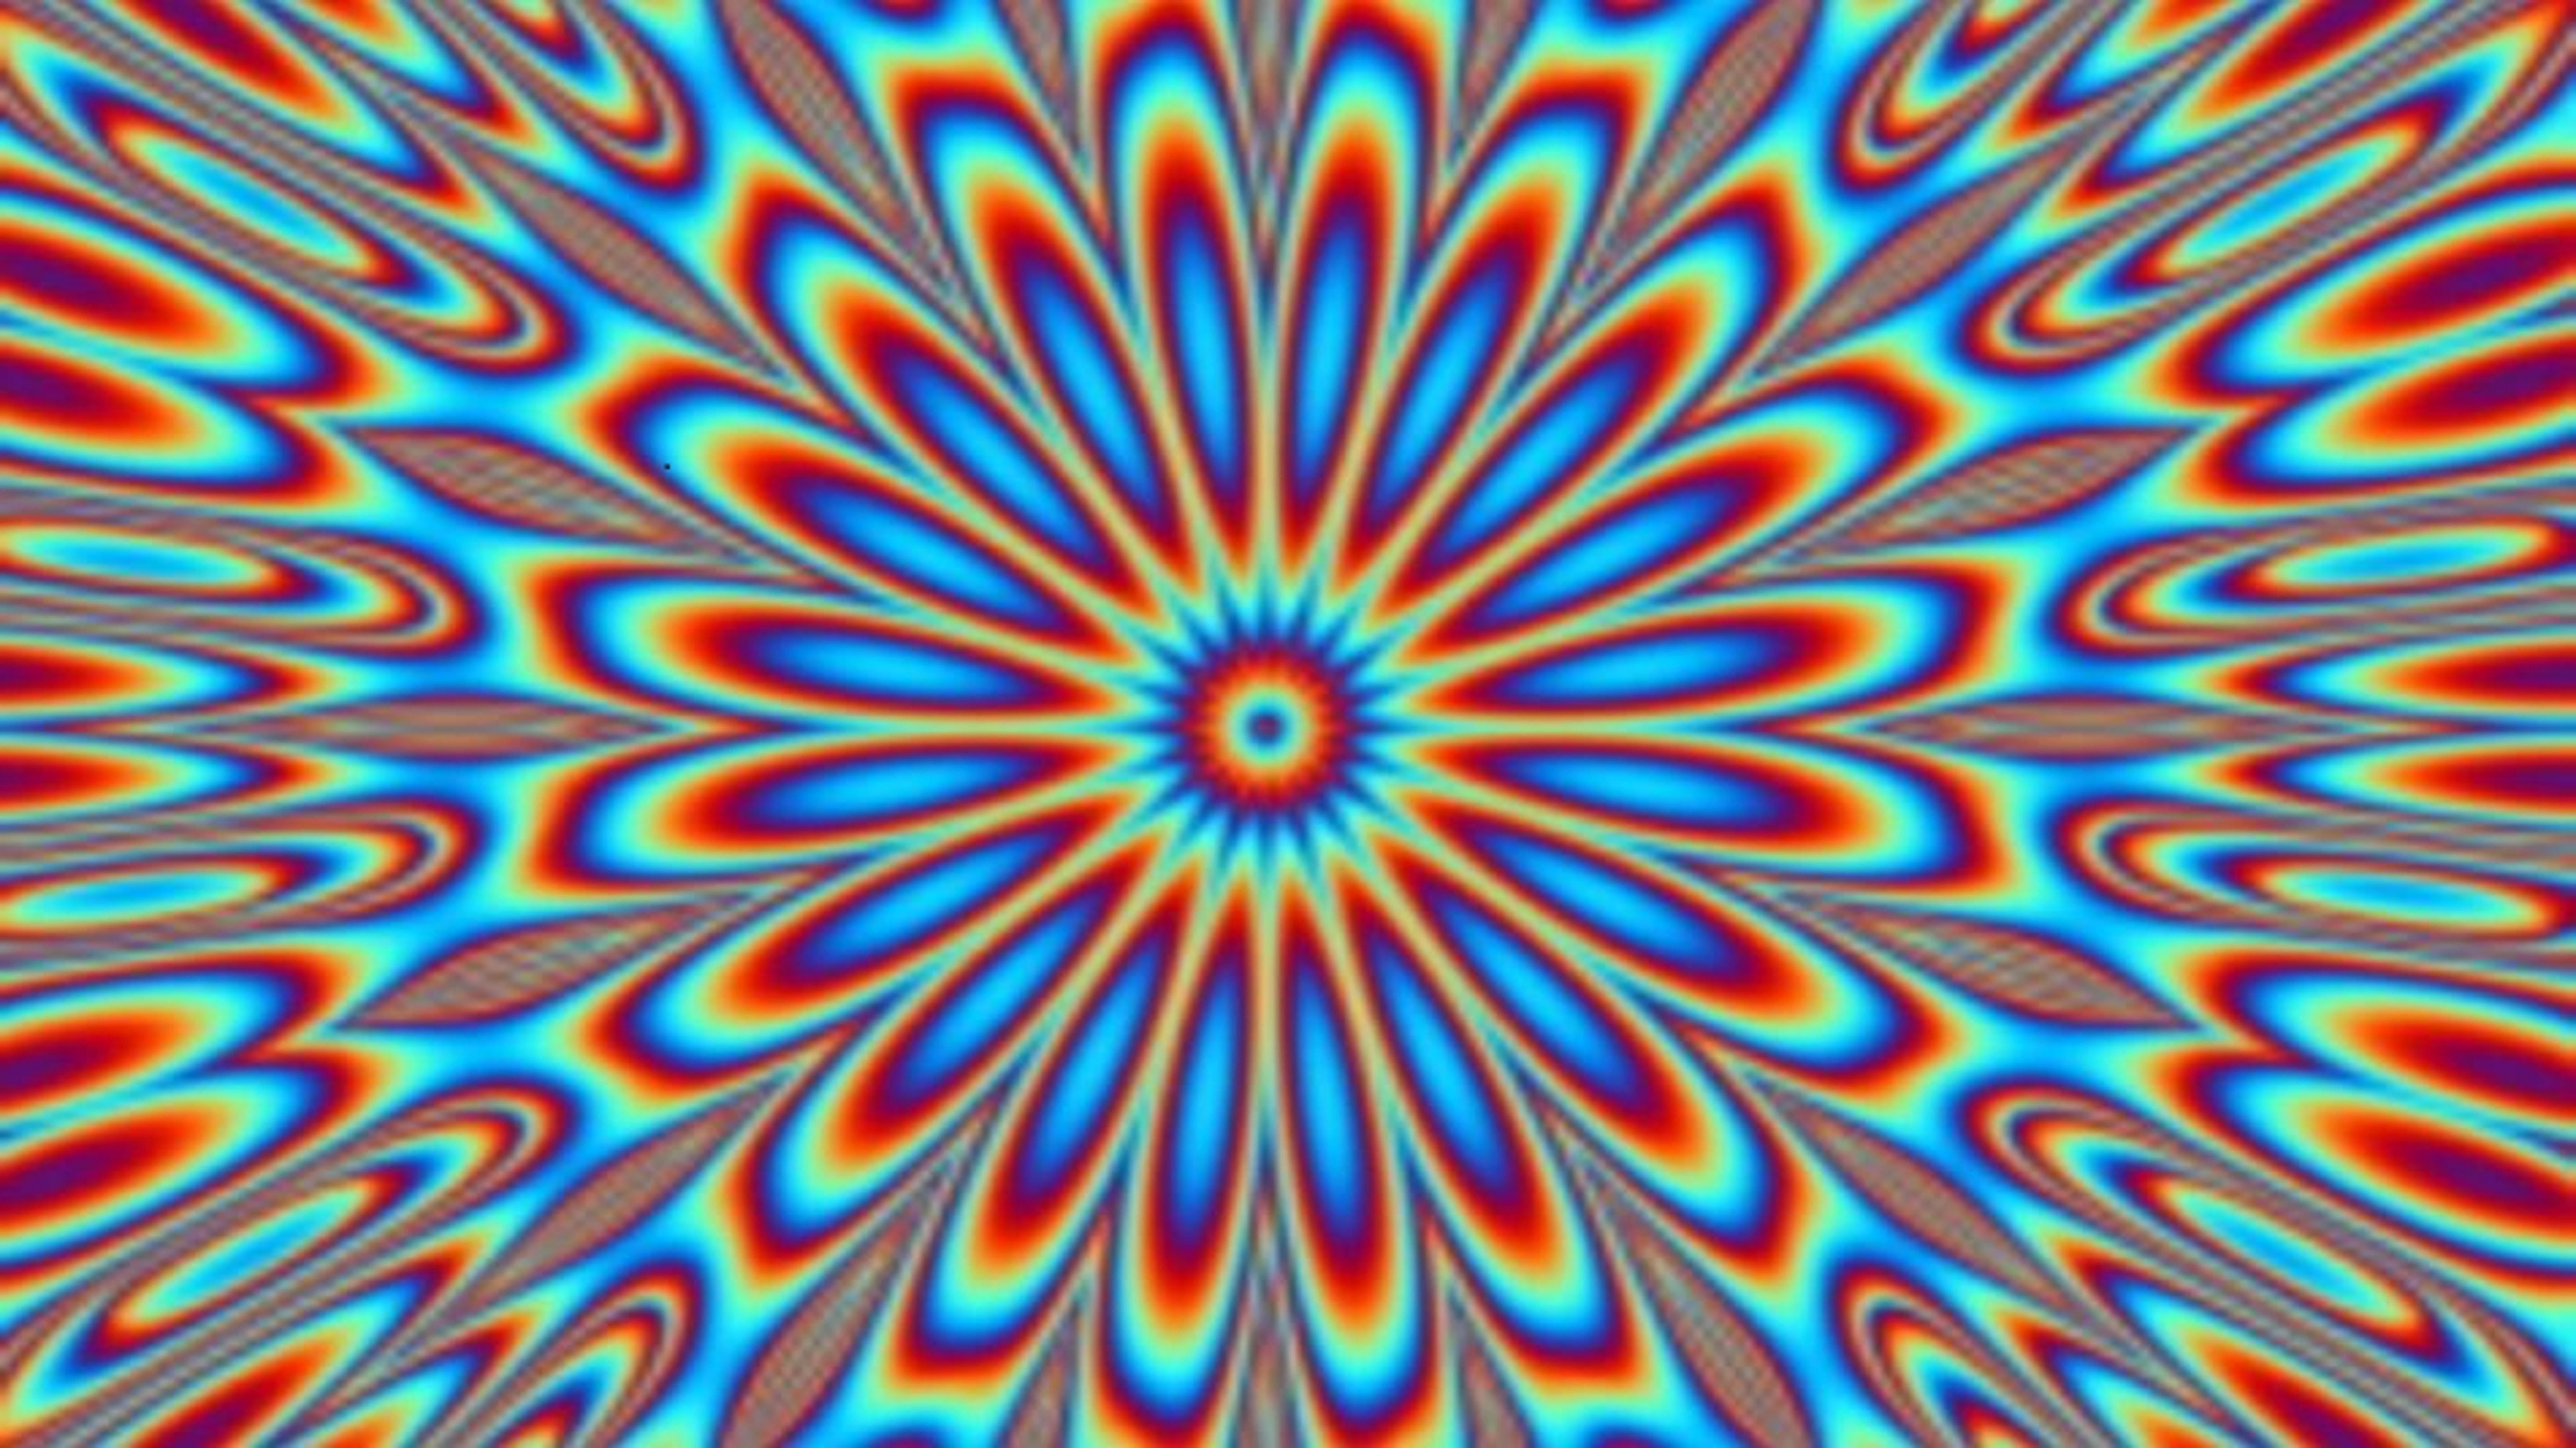 Psychedelic Computer Wallpapers Desktop Backgrounds 9900x5564